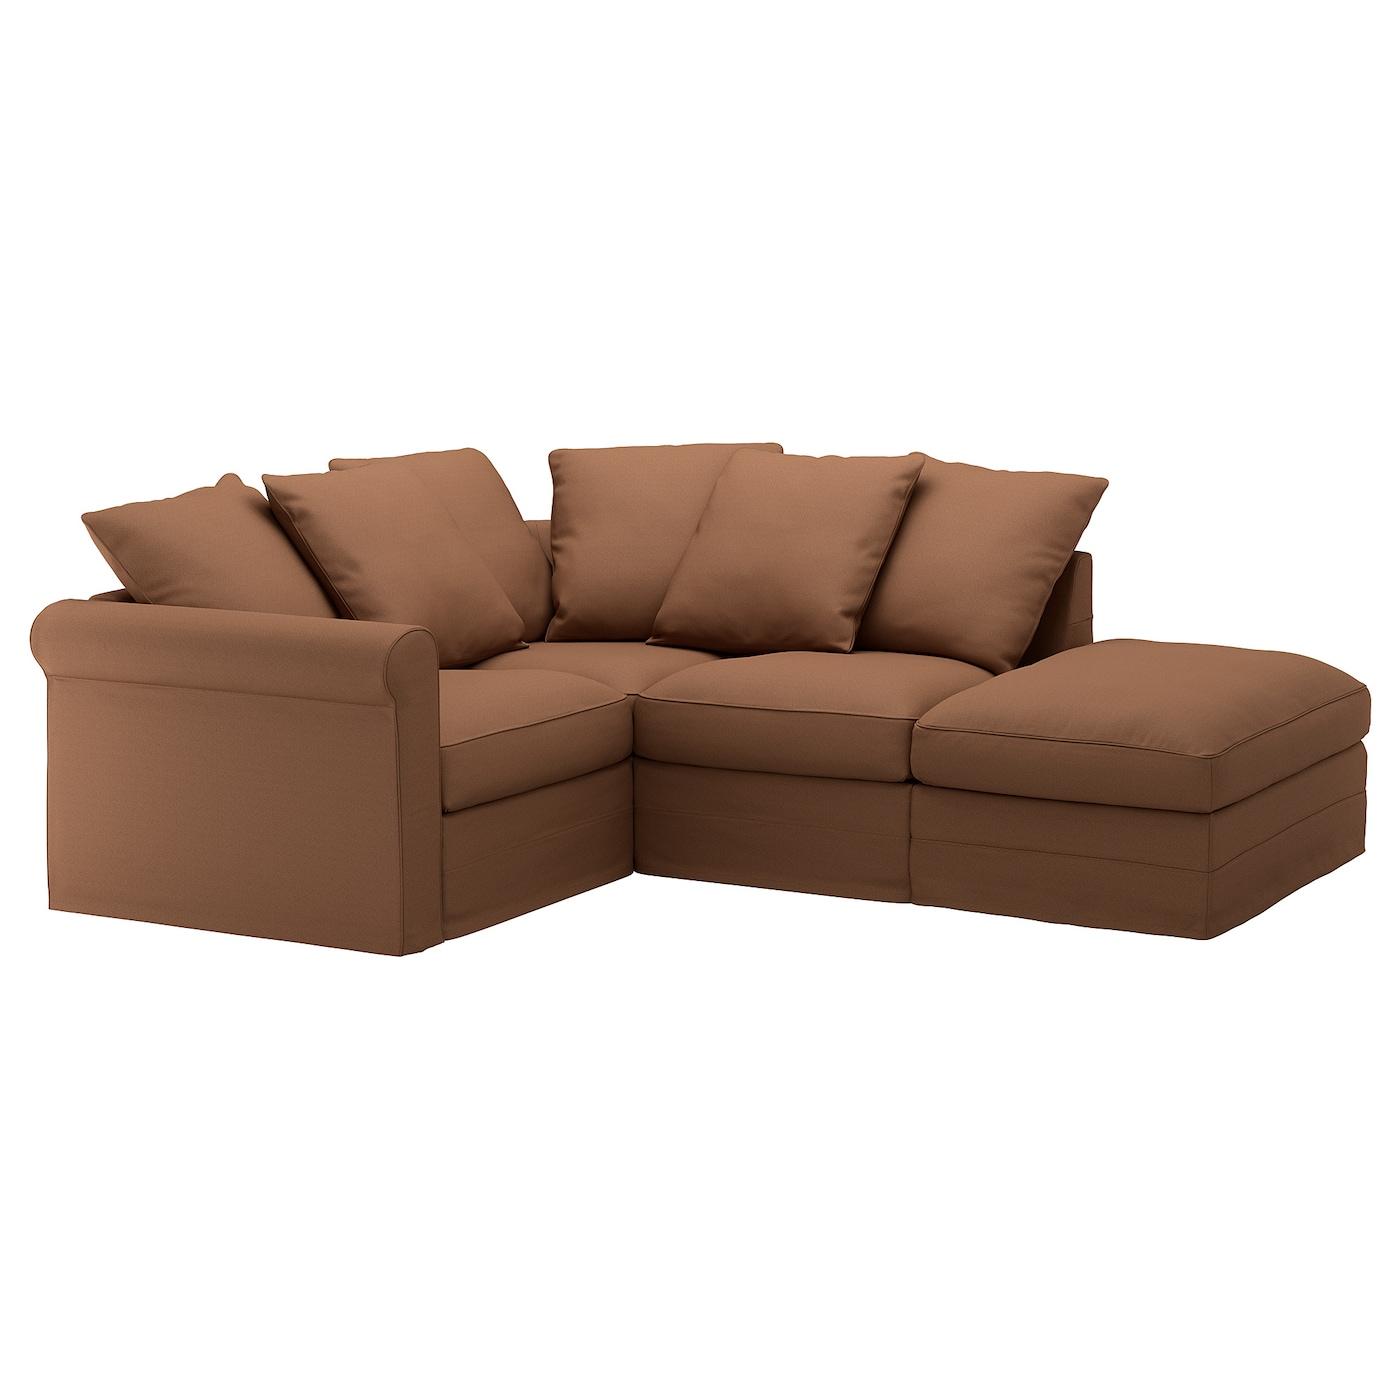 fabric sofas ikea. Black Bedroom Furniture Sets. Home Design Ideas